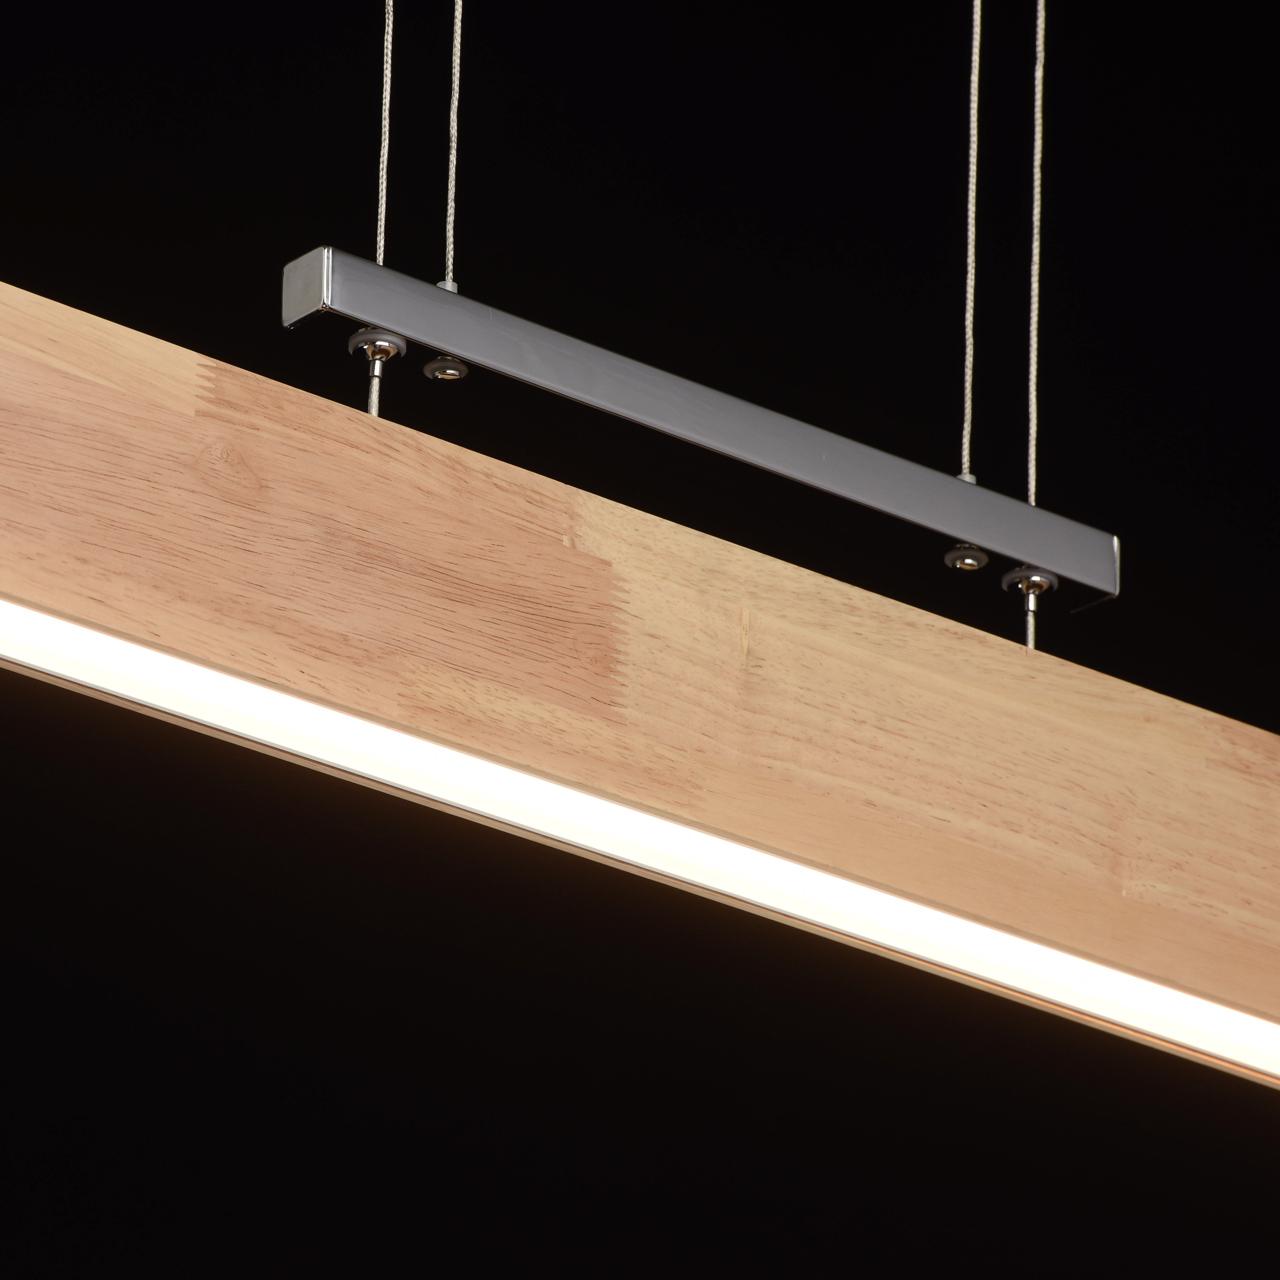 elegancka lampa wisz ca do jadalni led drewno chrom sklep internetowy. Black Bedroom Furniture Sets. Home Design Ideas